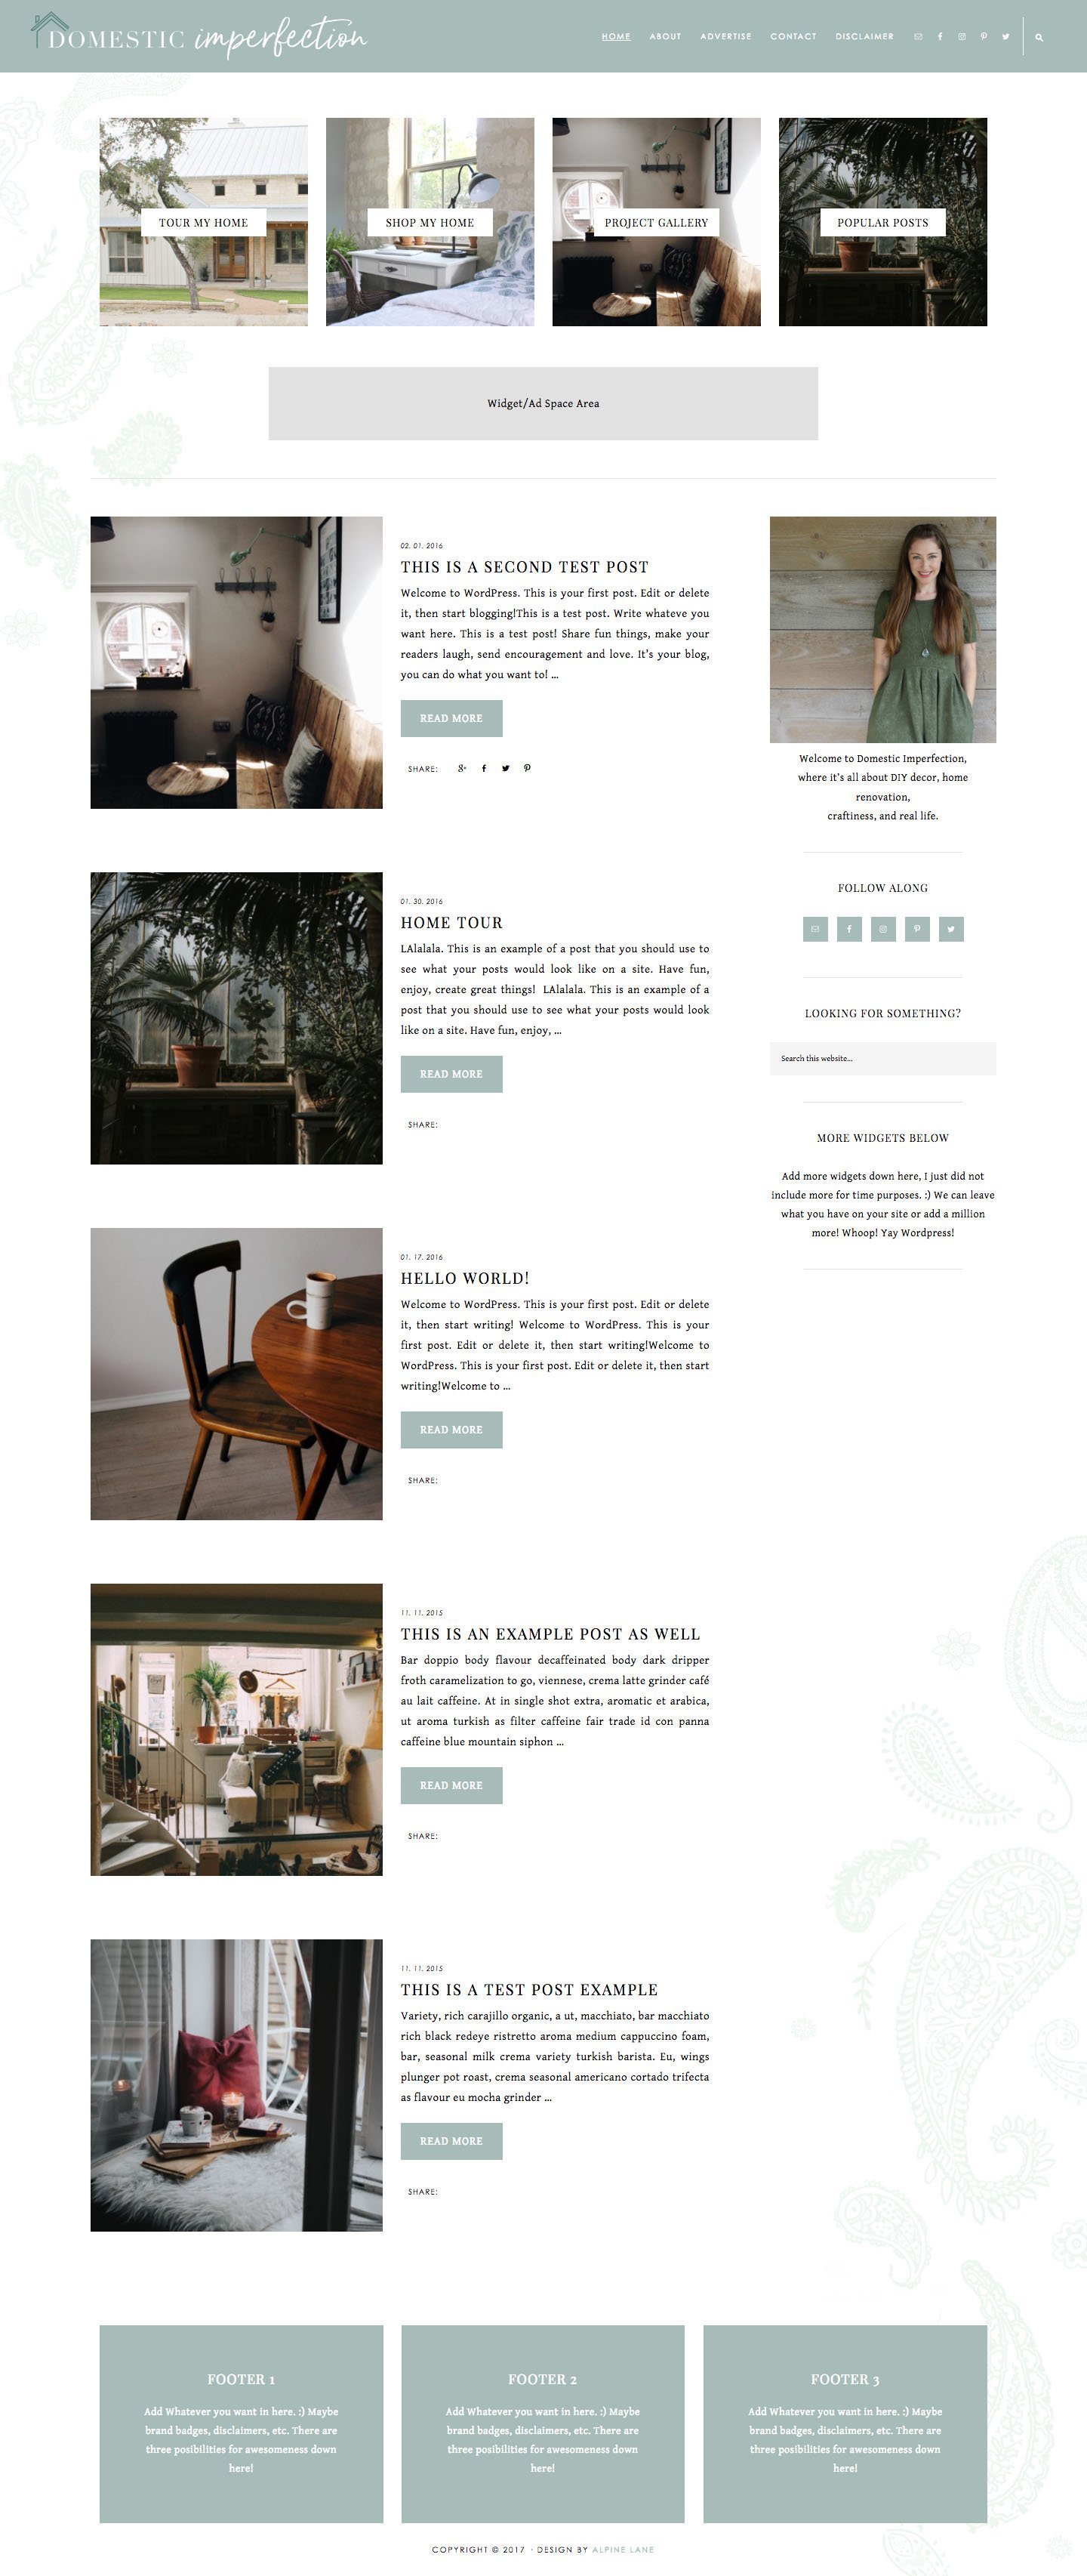 Domestic Imperfection custom blog design by Alpine Lane Creative Studio